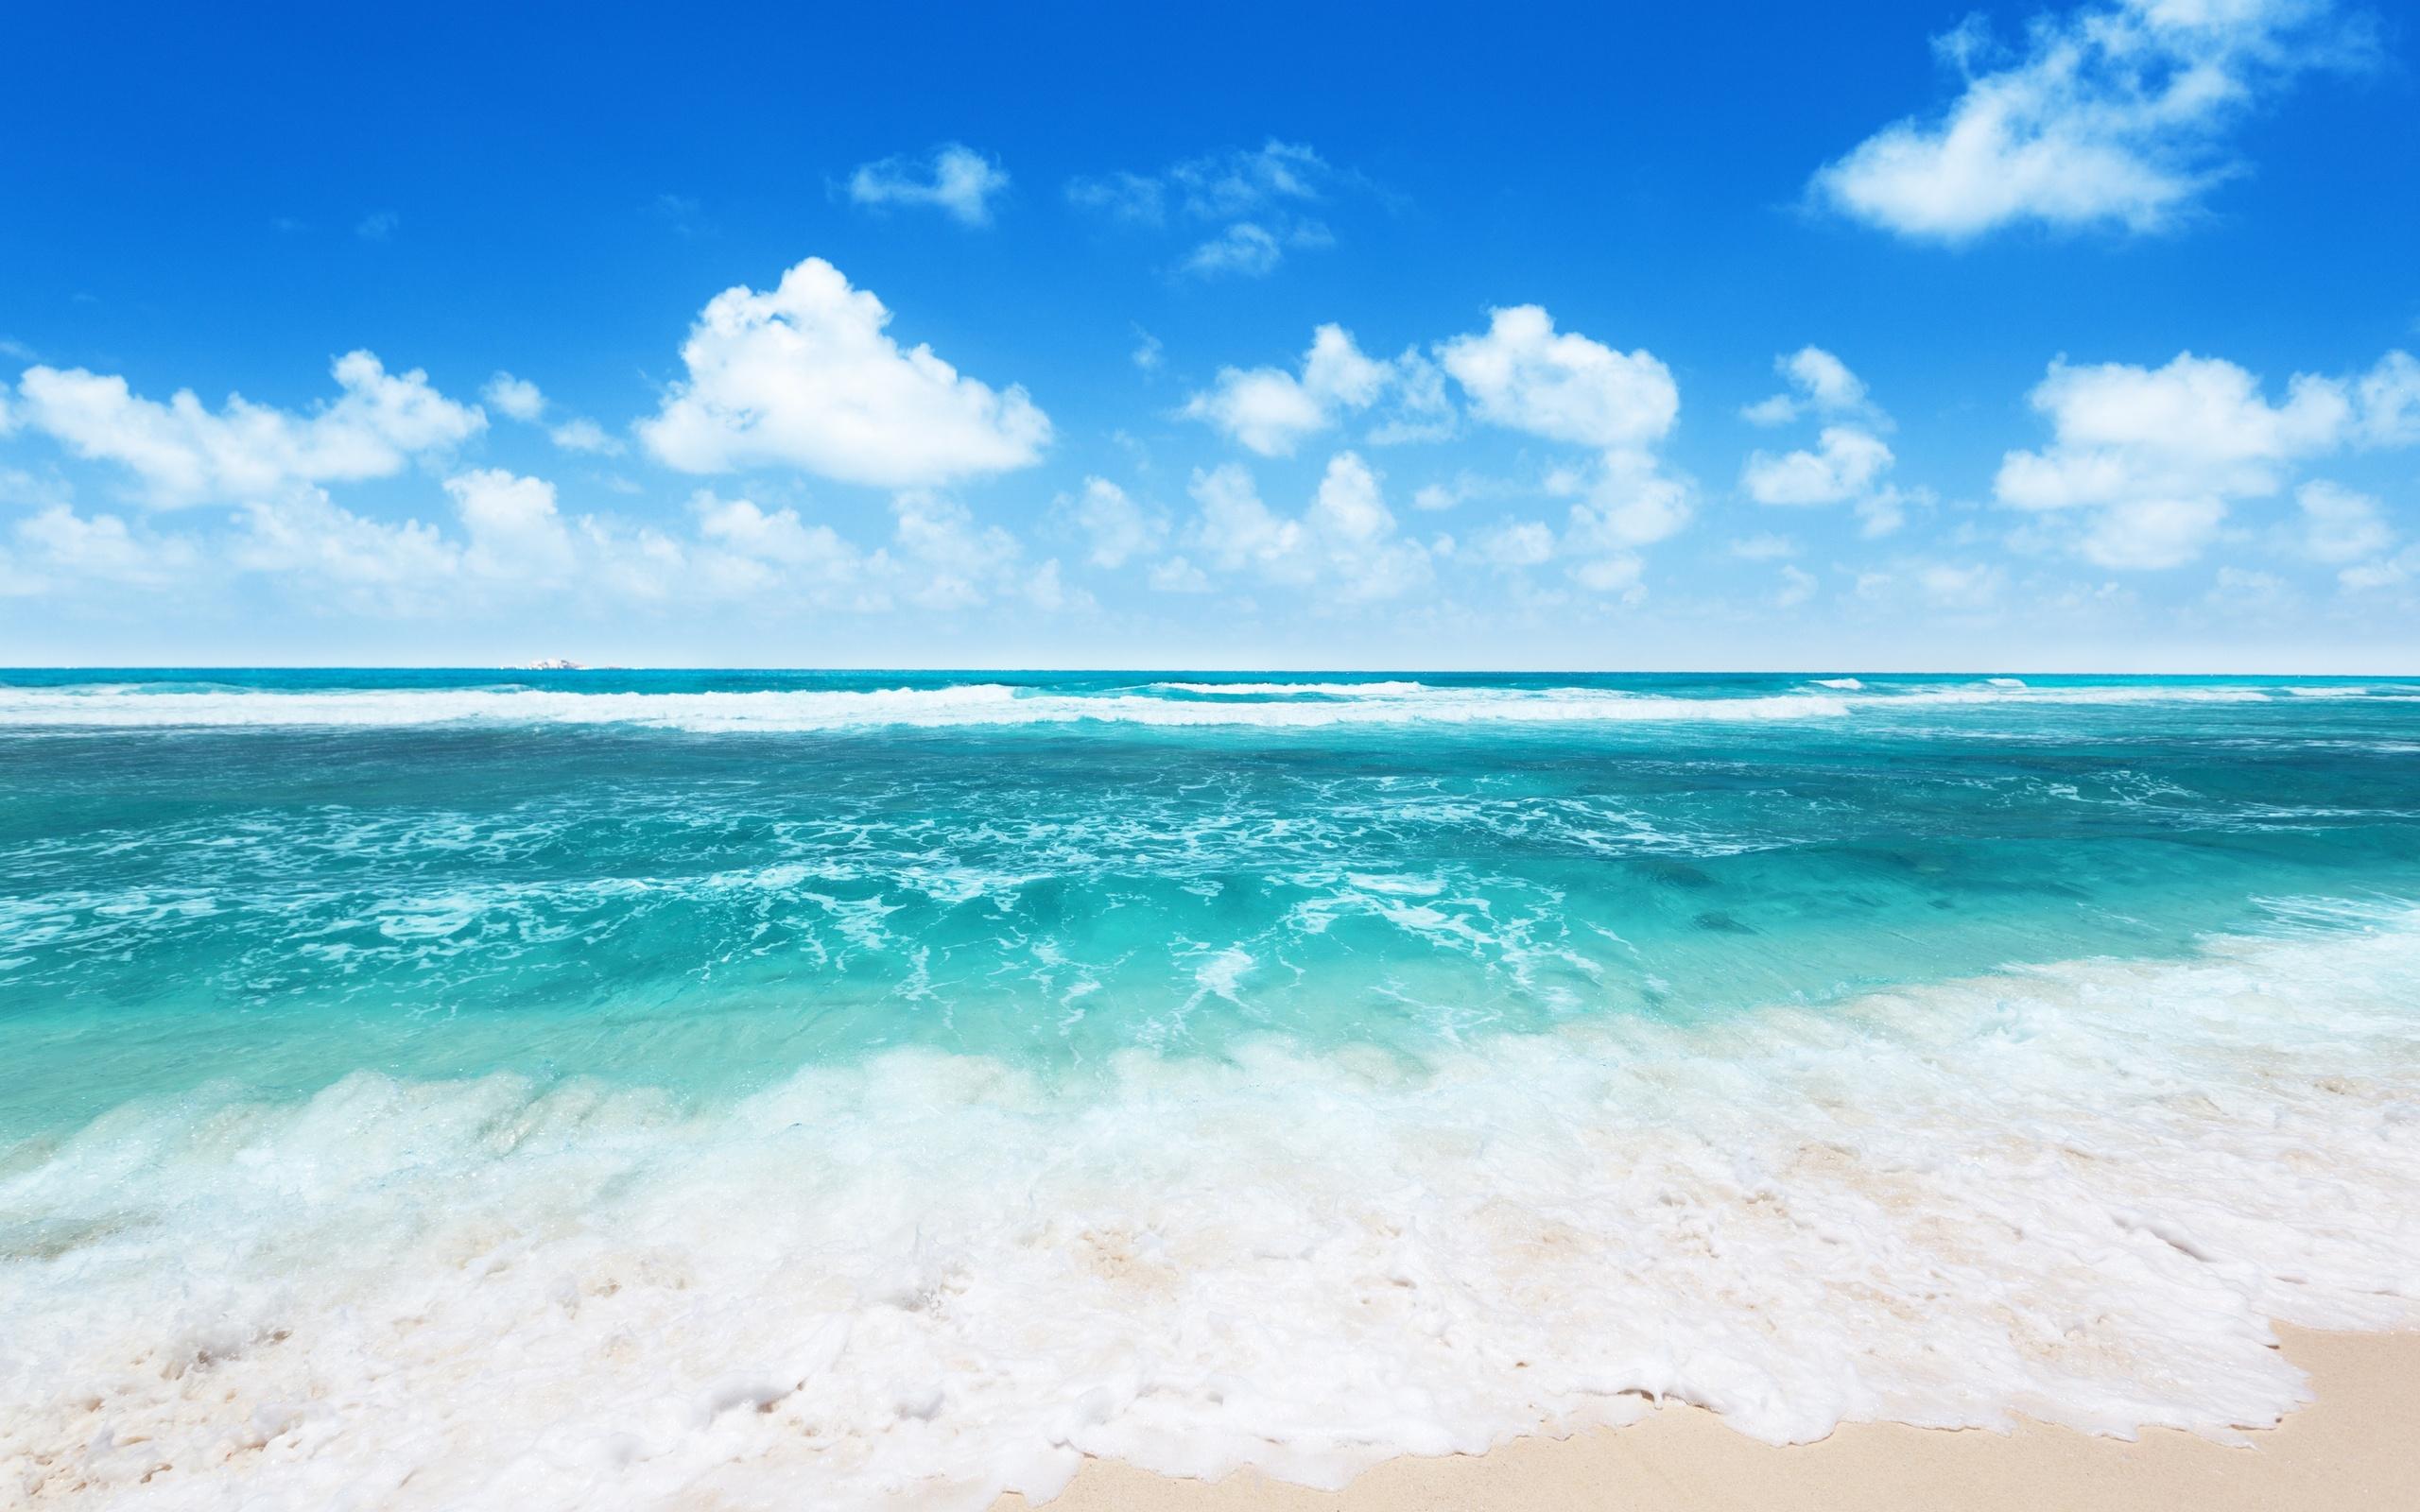 Waves sea water nature ocean wallpaper 2560x1600 2560x1600